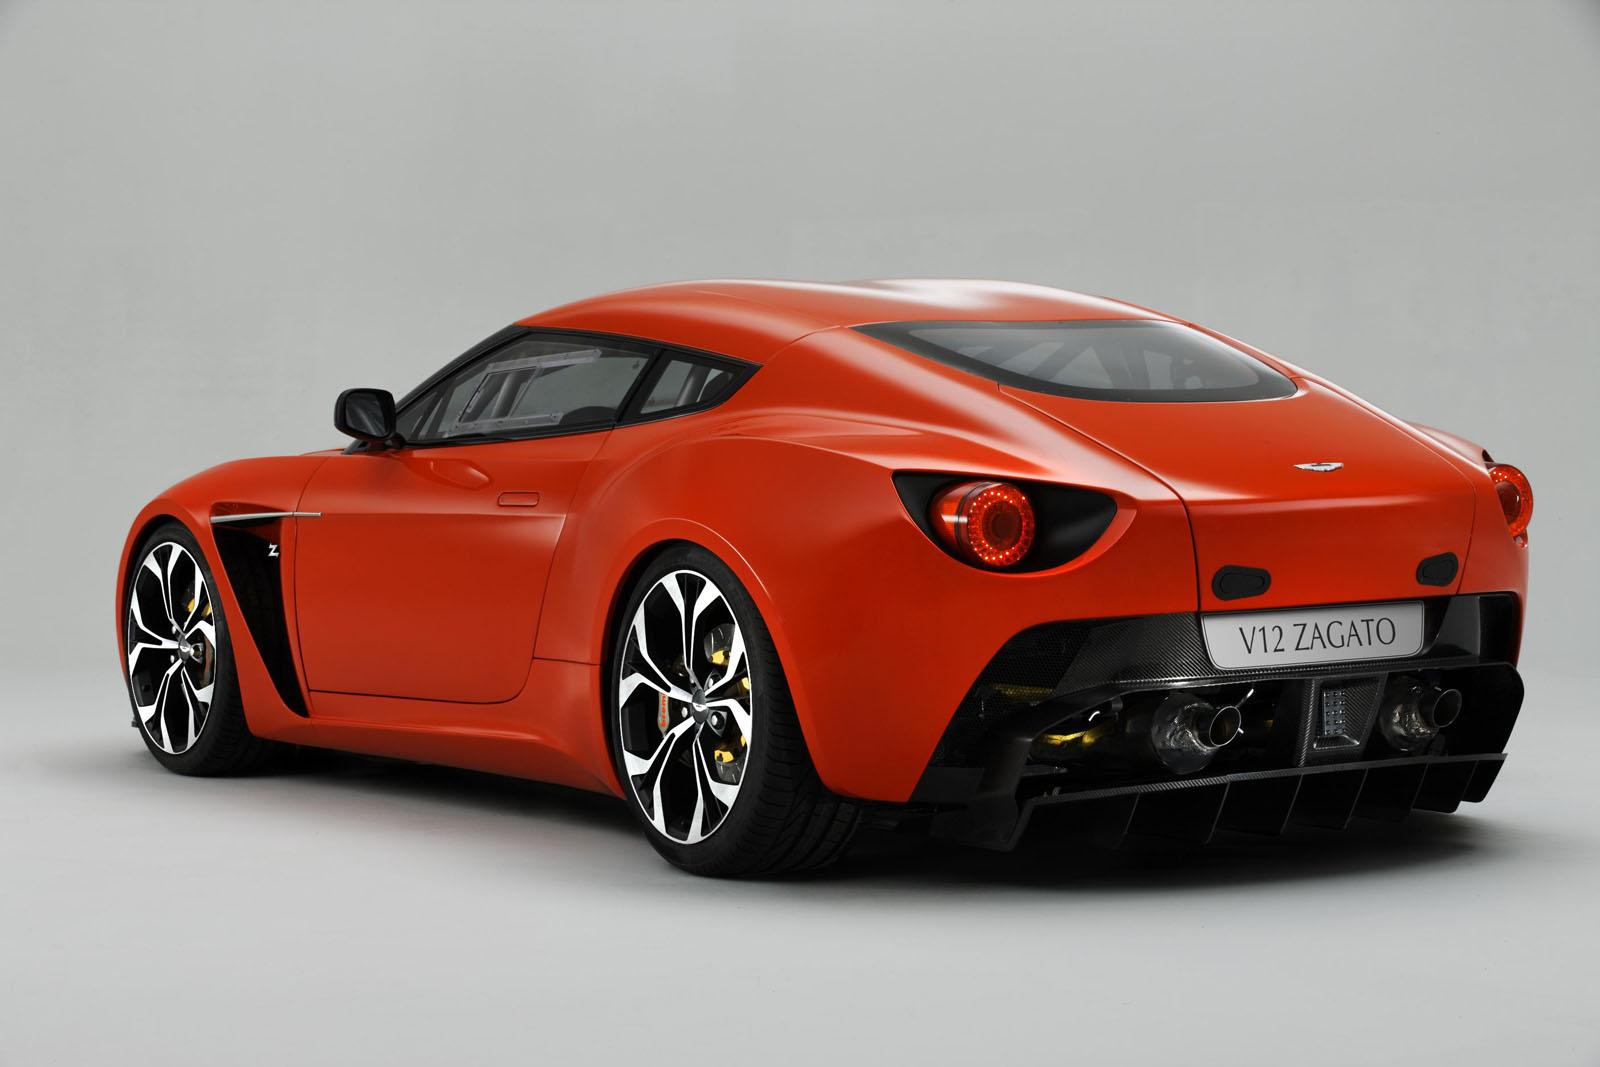 Striking Aston Martin V Zagato Revealed BenAutobahn - Aston martin v12